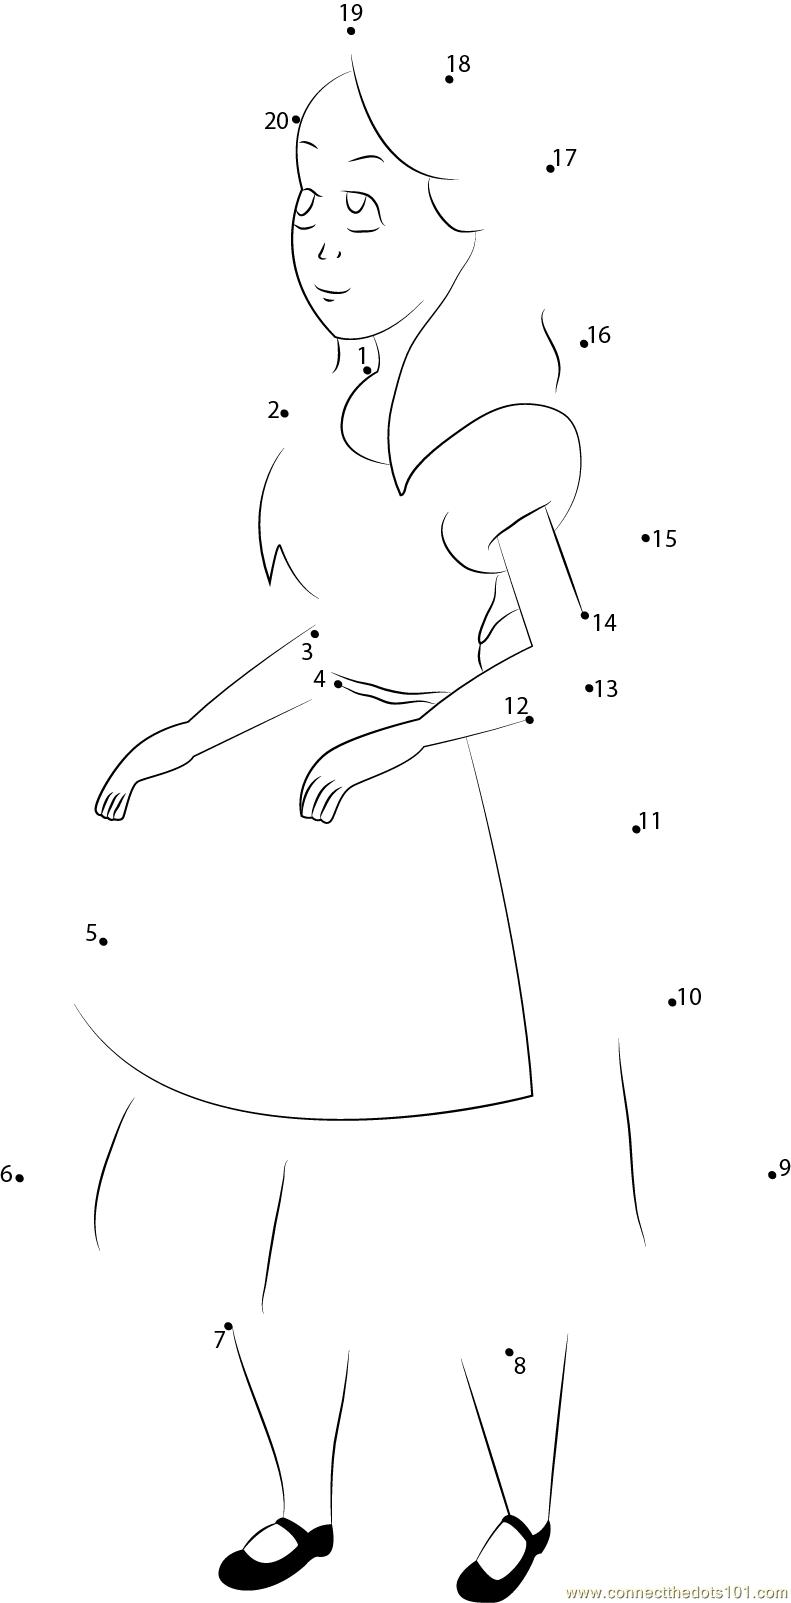 Alice In Wonderland Dot To Dot Printable Worksheet